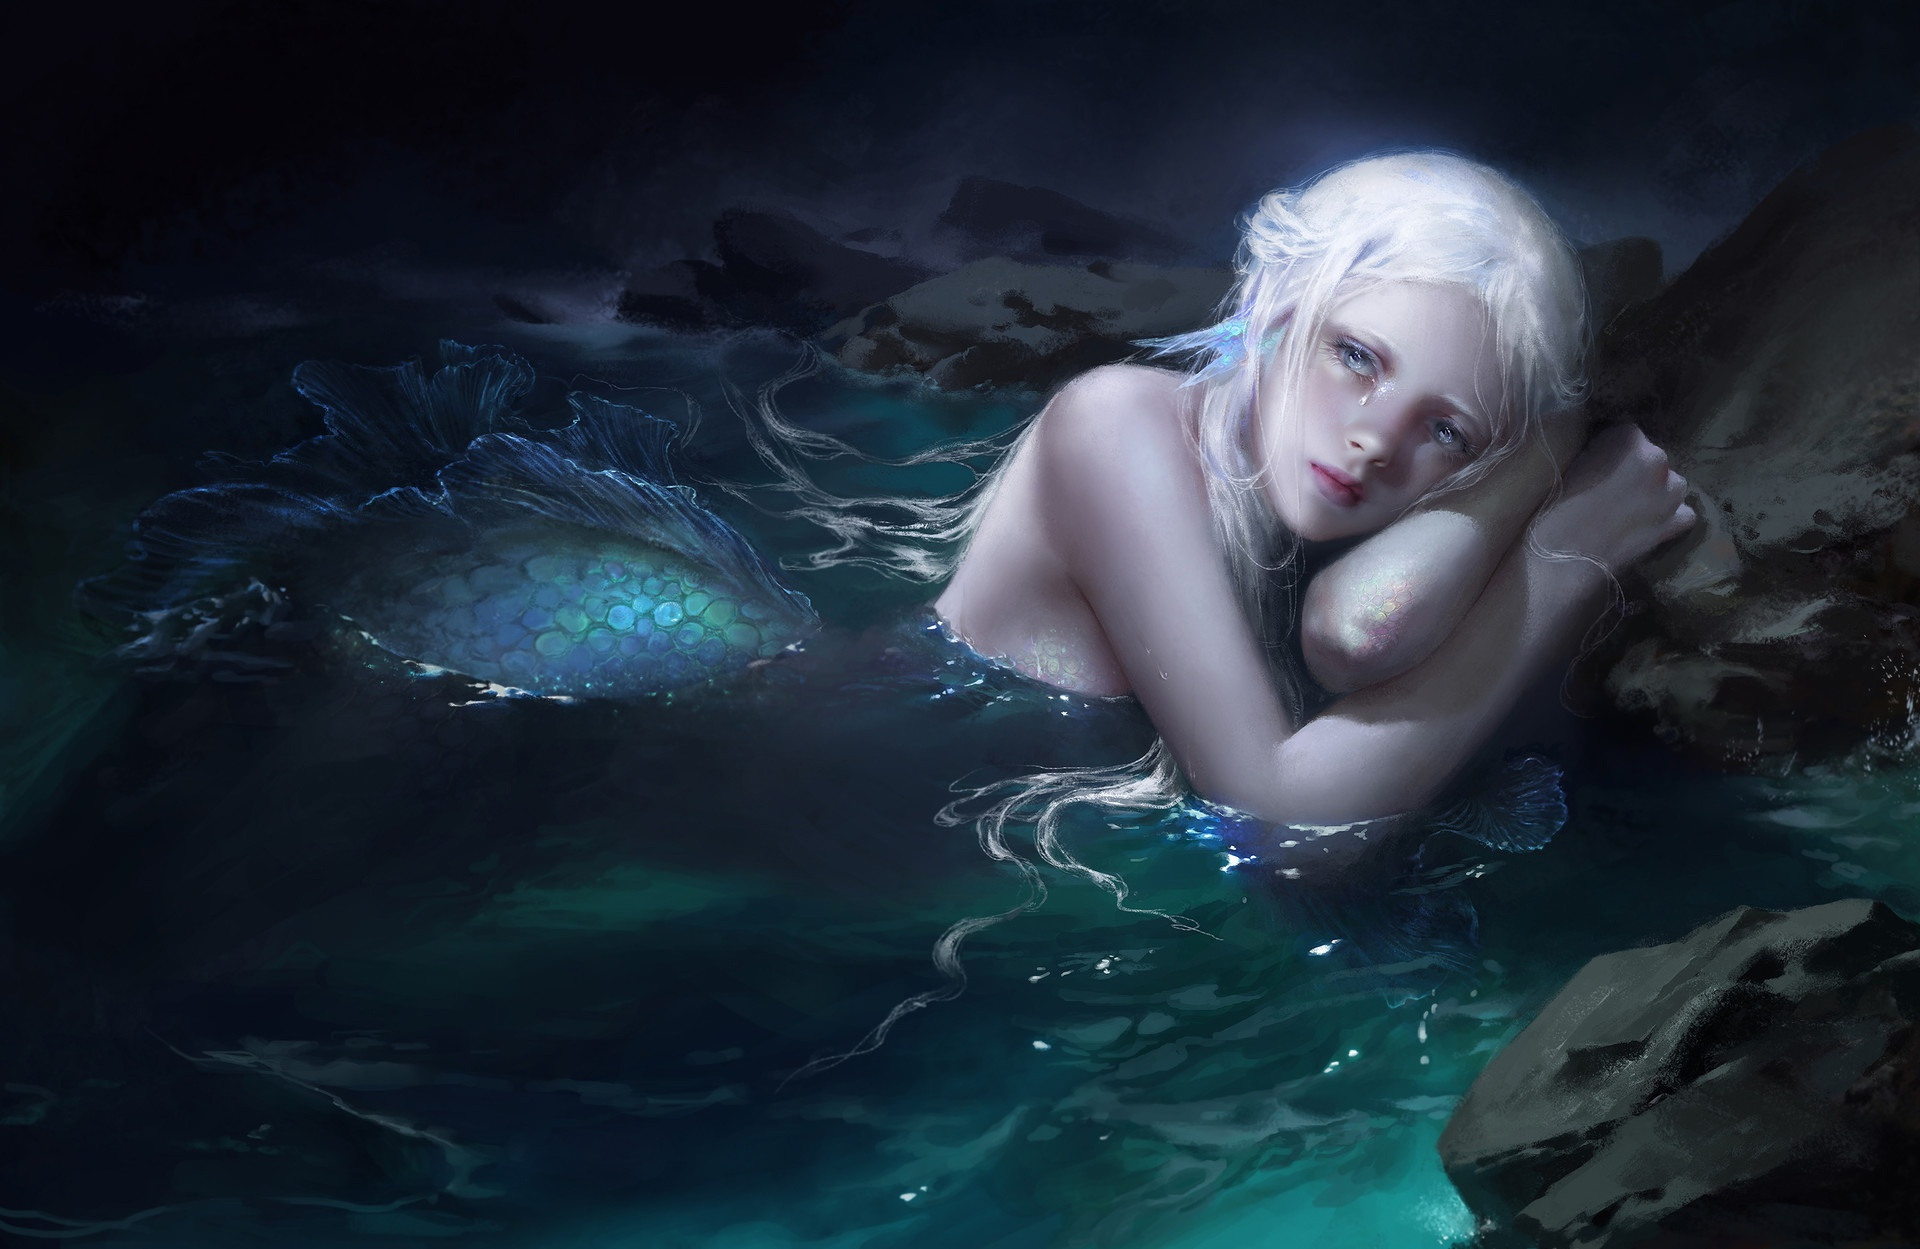 Картинки фэнтези девушка в воде